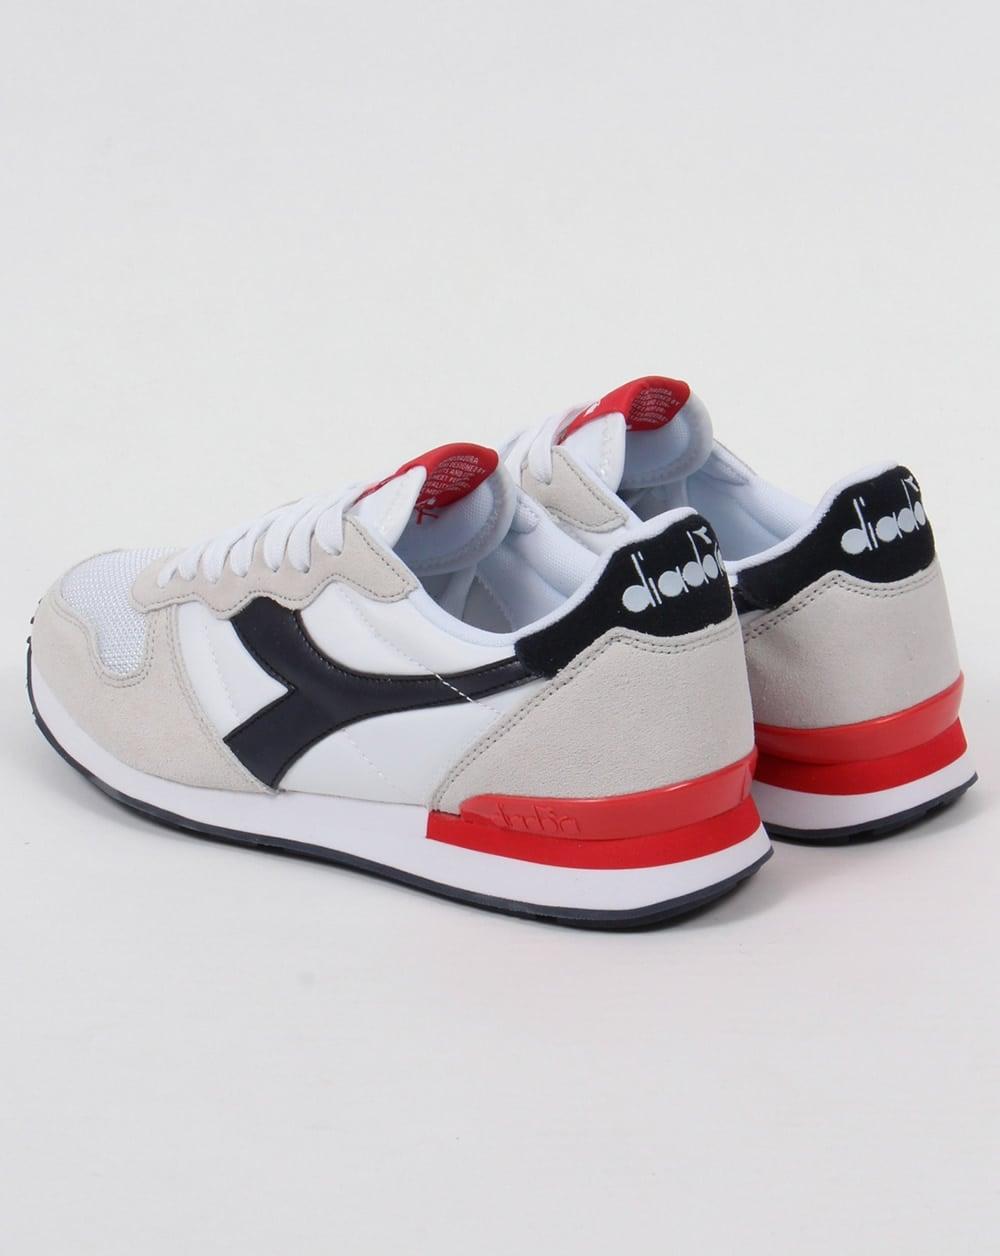 Diadora Camaro Shoes Uk